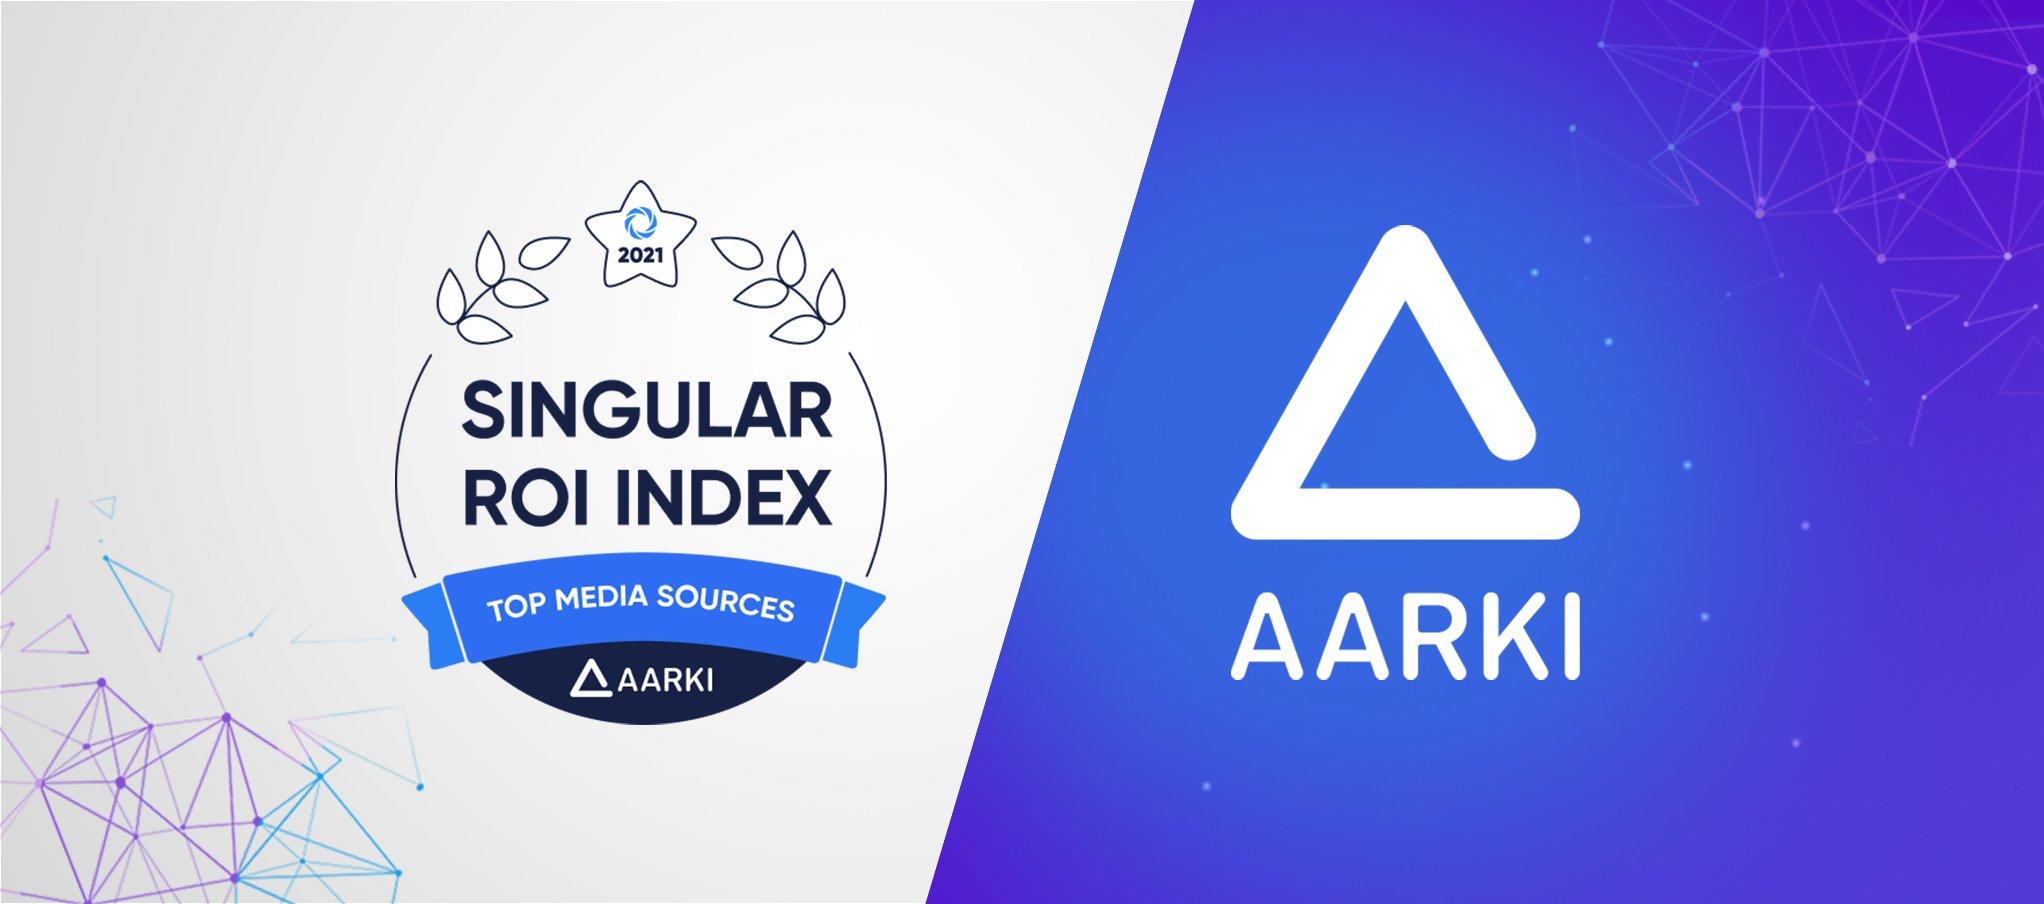 Aarki is part of the Singular ROI Index 2021